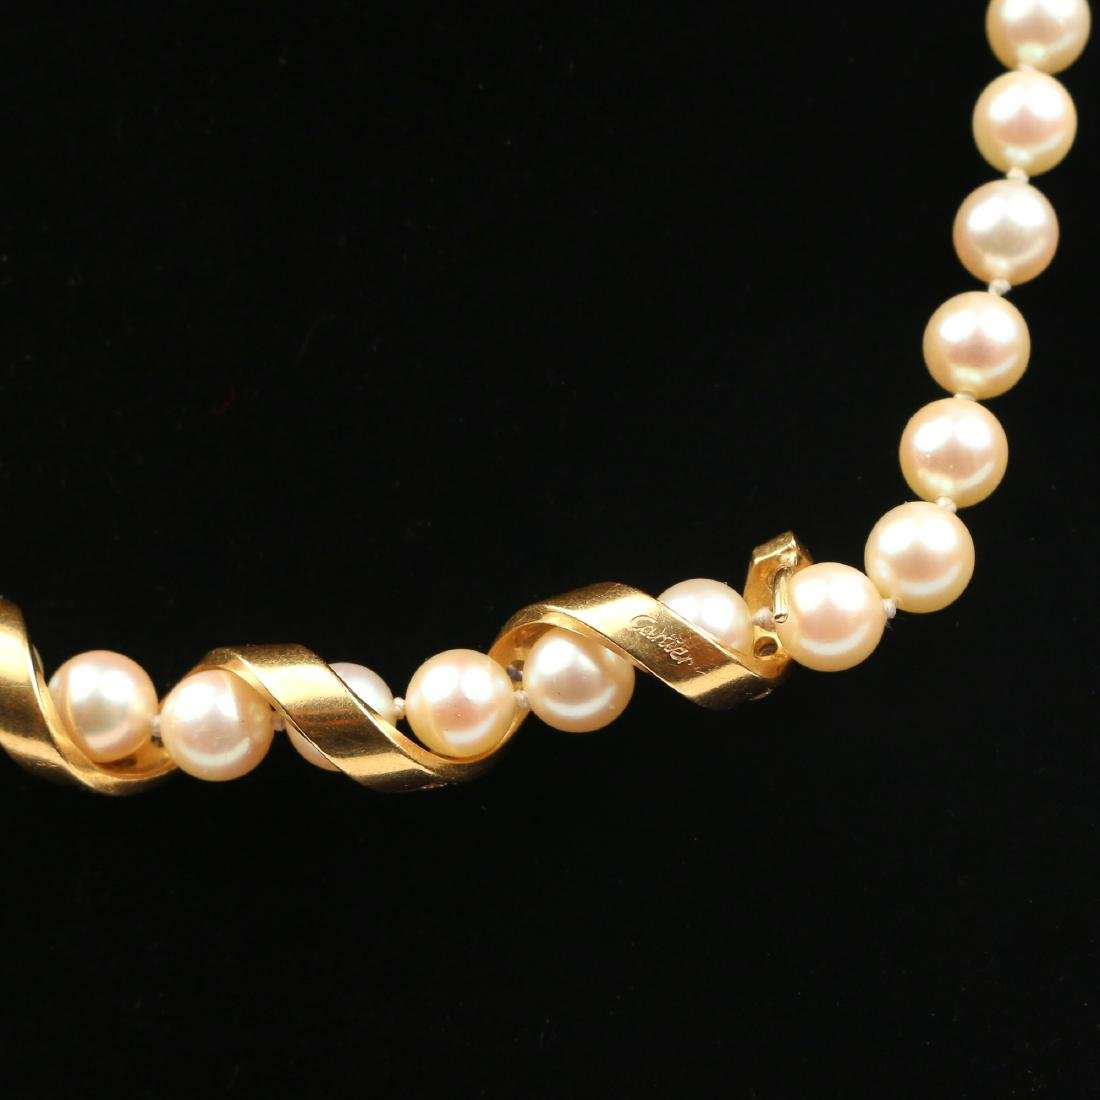 CARTIER TWIST DIAMOND, PEARL, & GOLD NECKLACE - 5